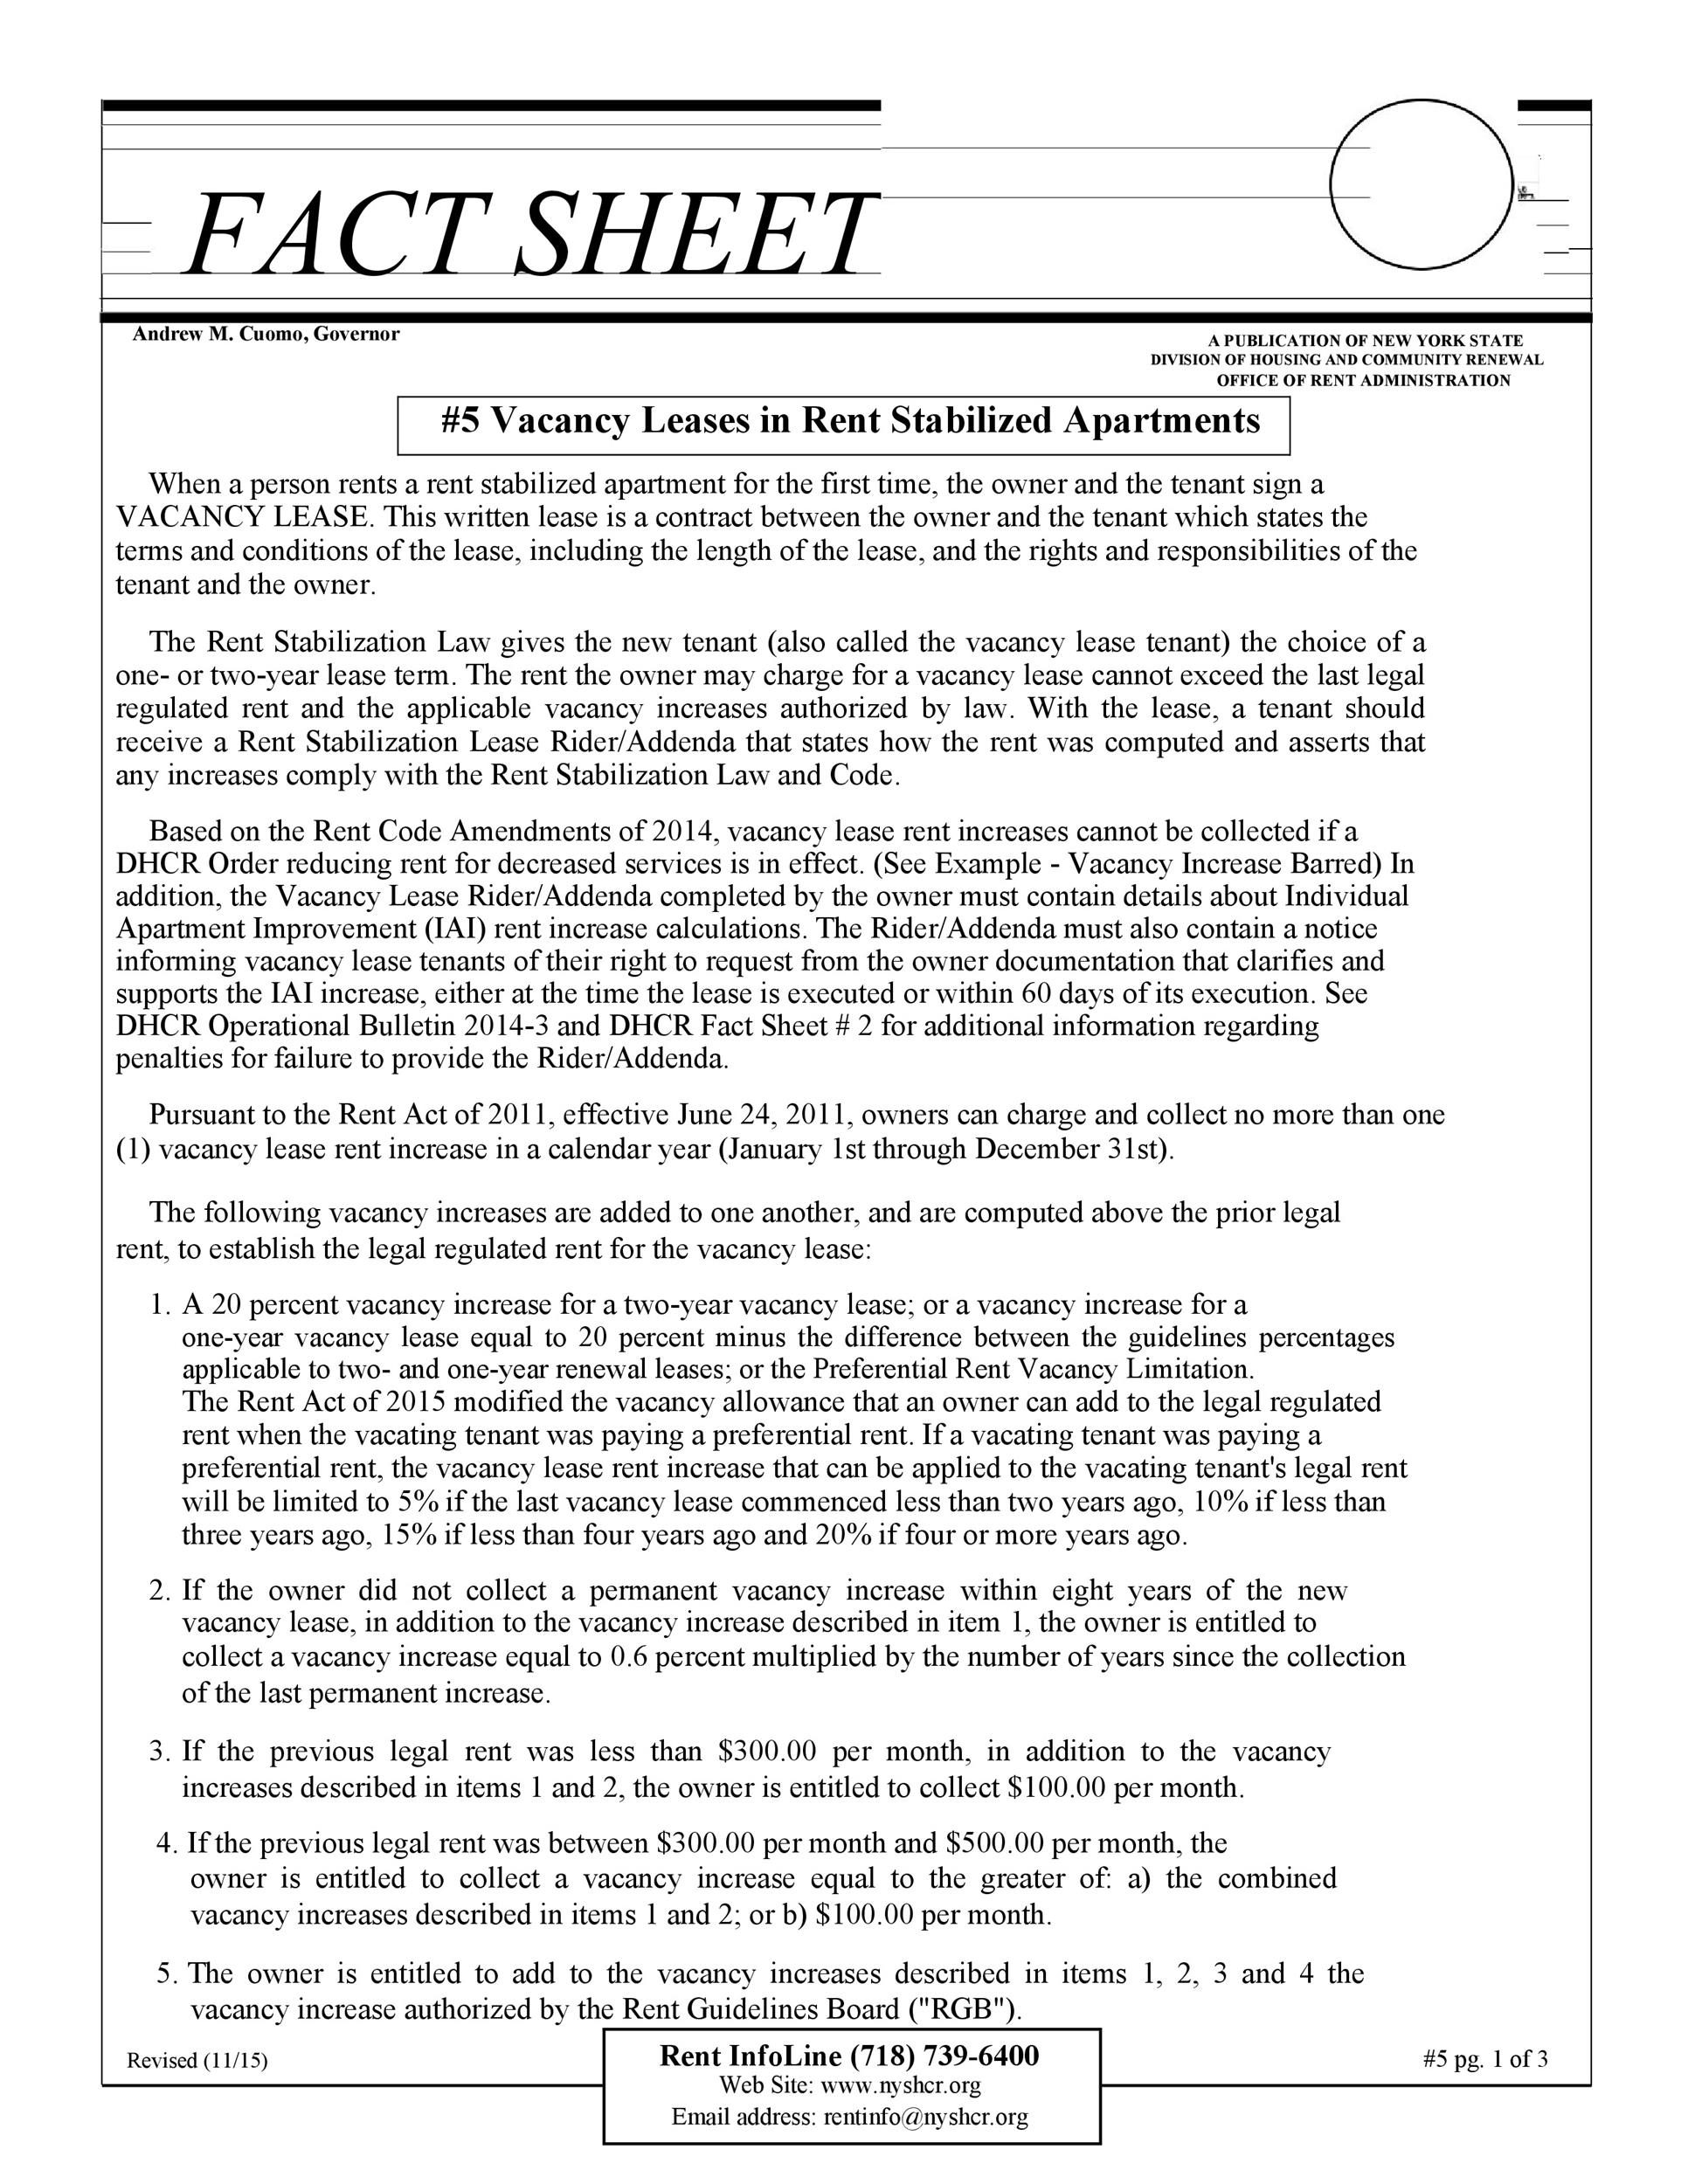 Free Fact sheet Template 53